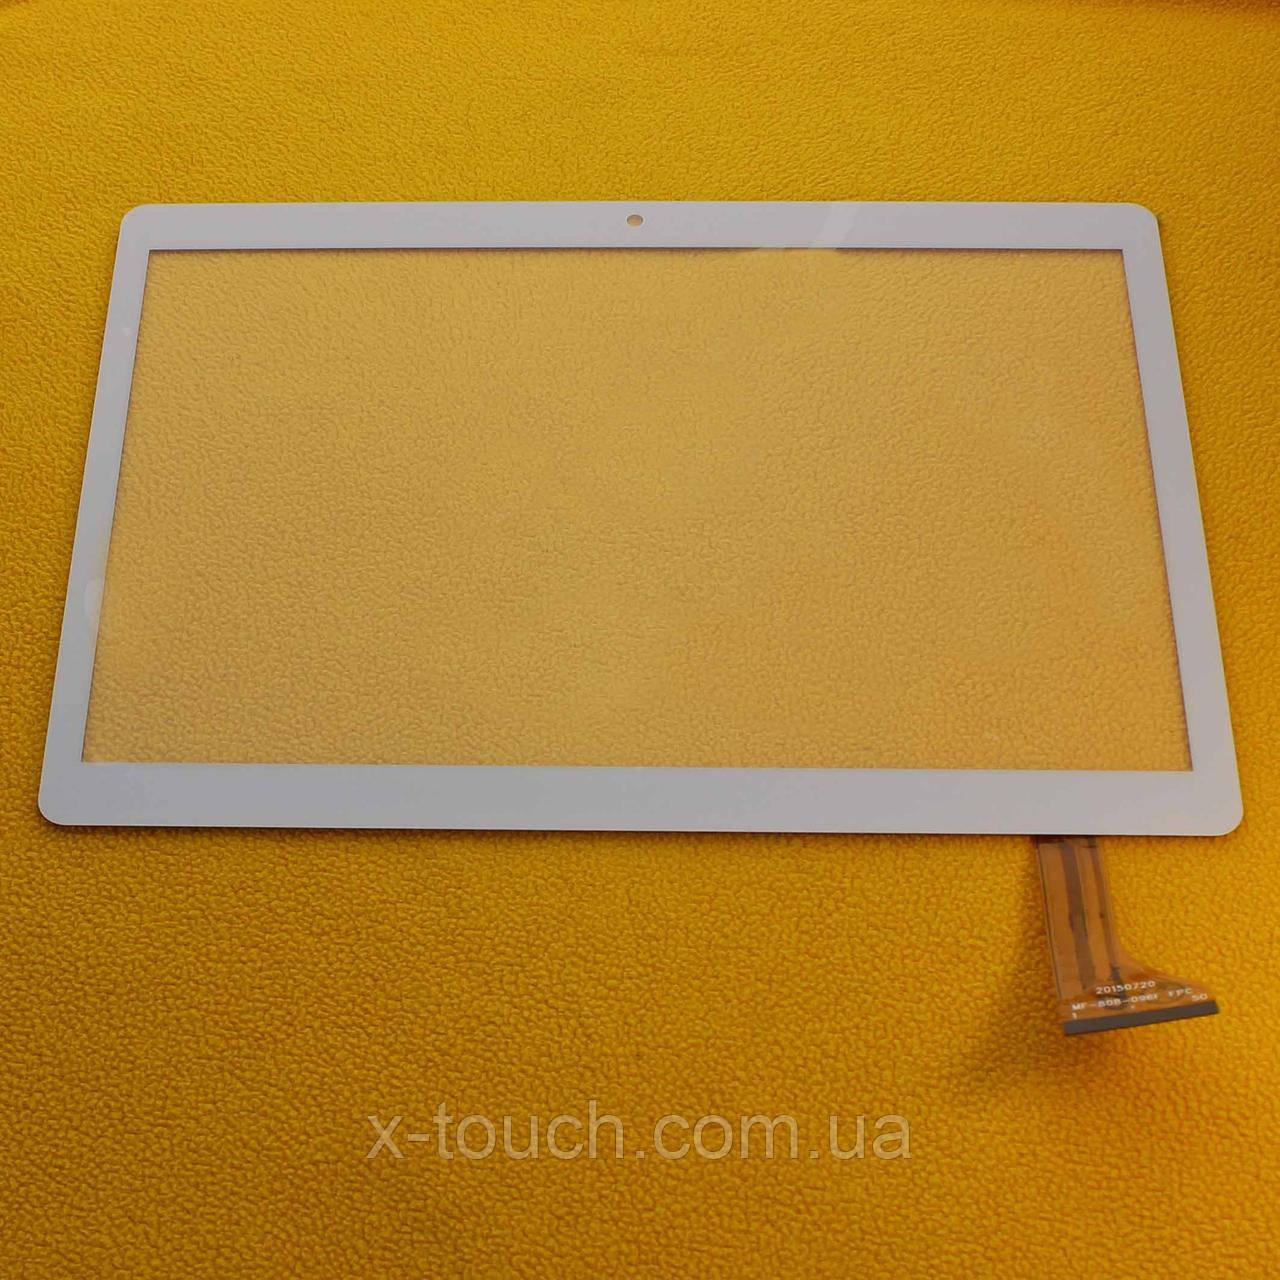 Тачскрин, сенсор MJK-0411 для планшета, 222х157 цвет белый